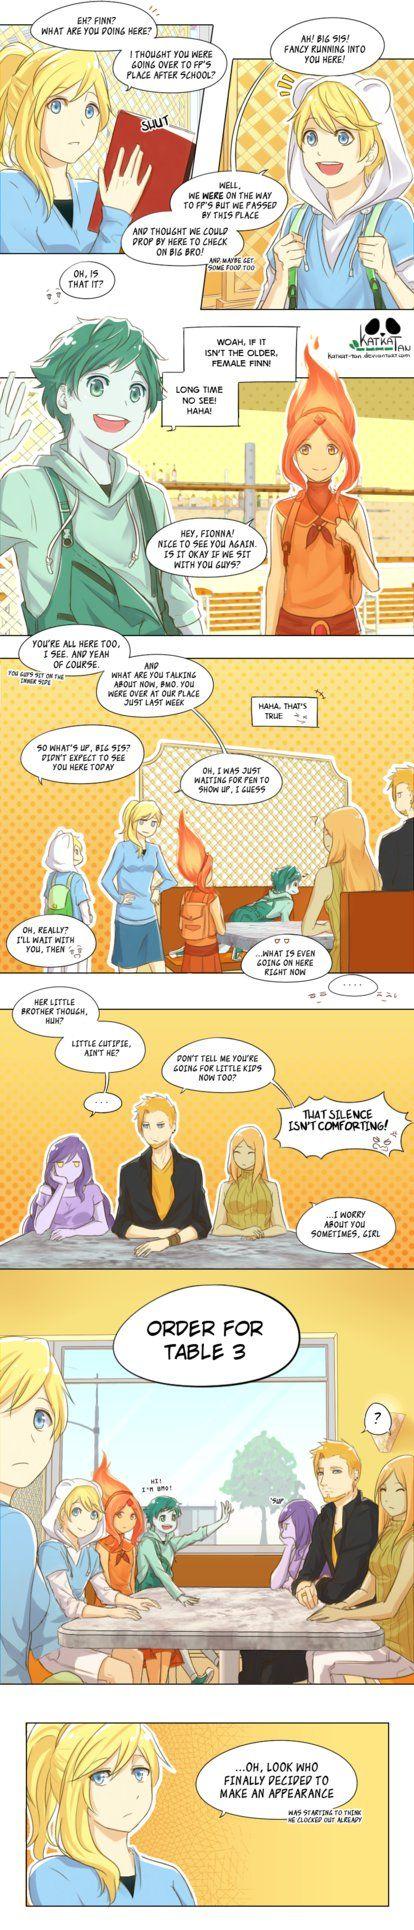 Adventure Time: Chap 3 - Page 17 by Katkat-Tan on DeviantArt